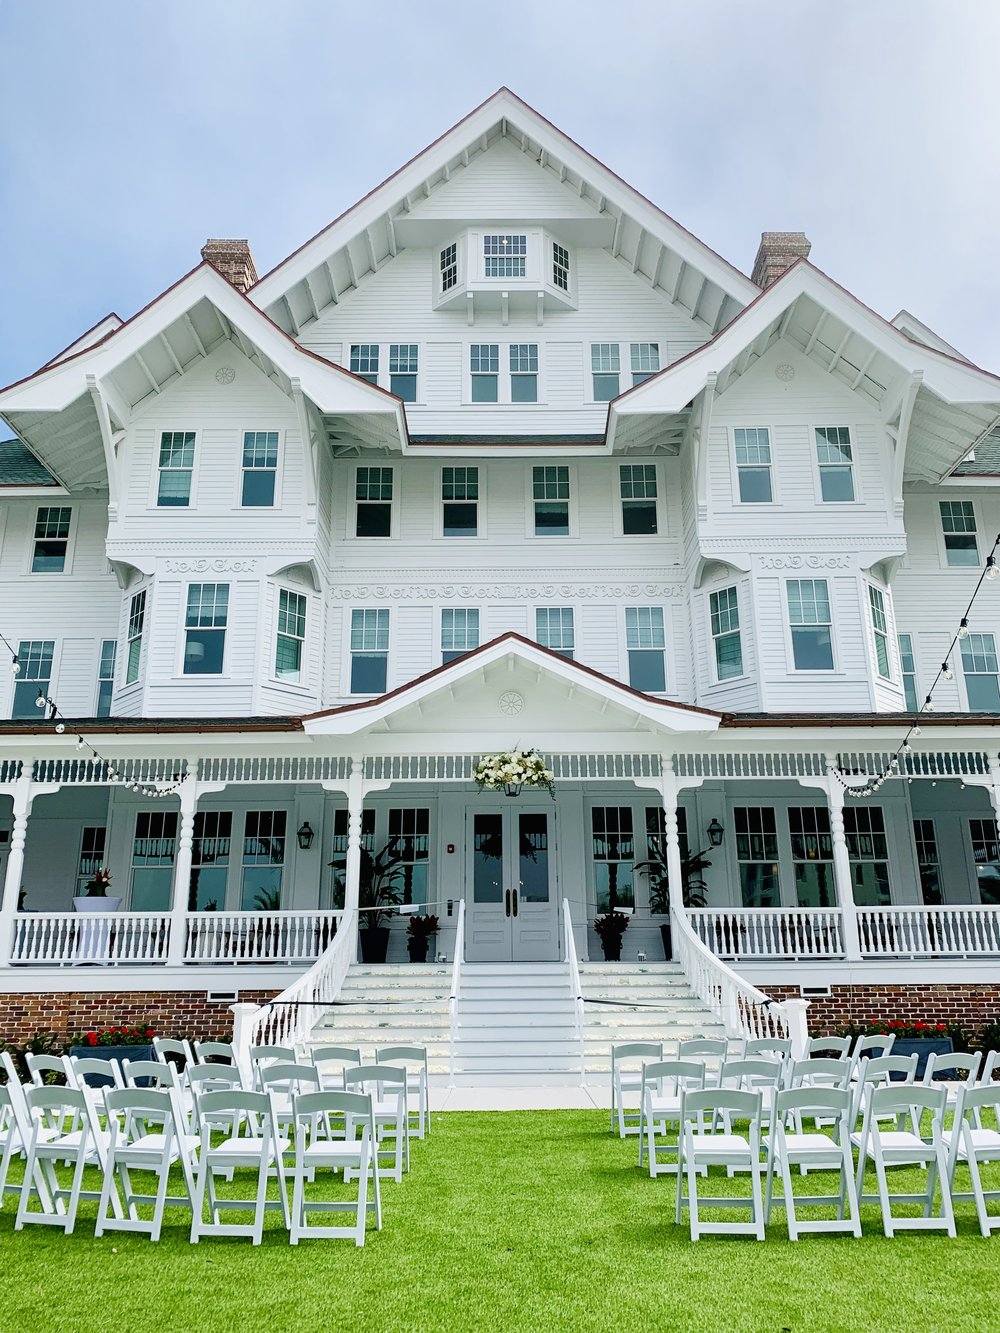 Belleview Inn, Belleview Weddings, Belleair Wedding, Belleview Wedding Photography, CLearwater Wedding Photography, Tampa Wedding Photographer, Limelight Photography